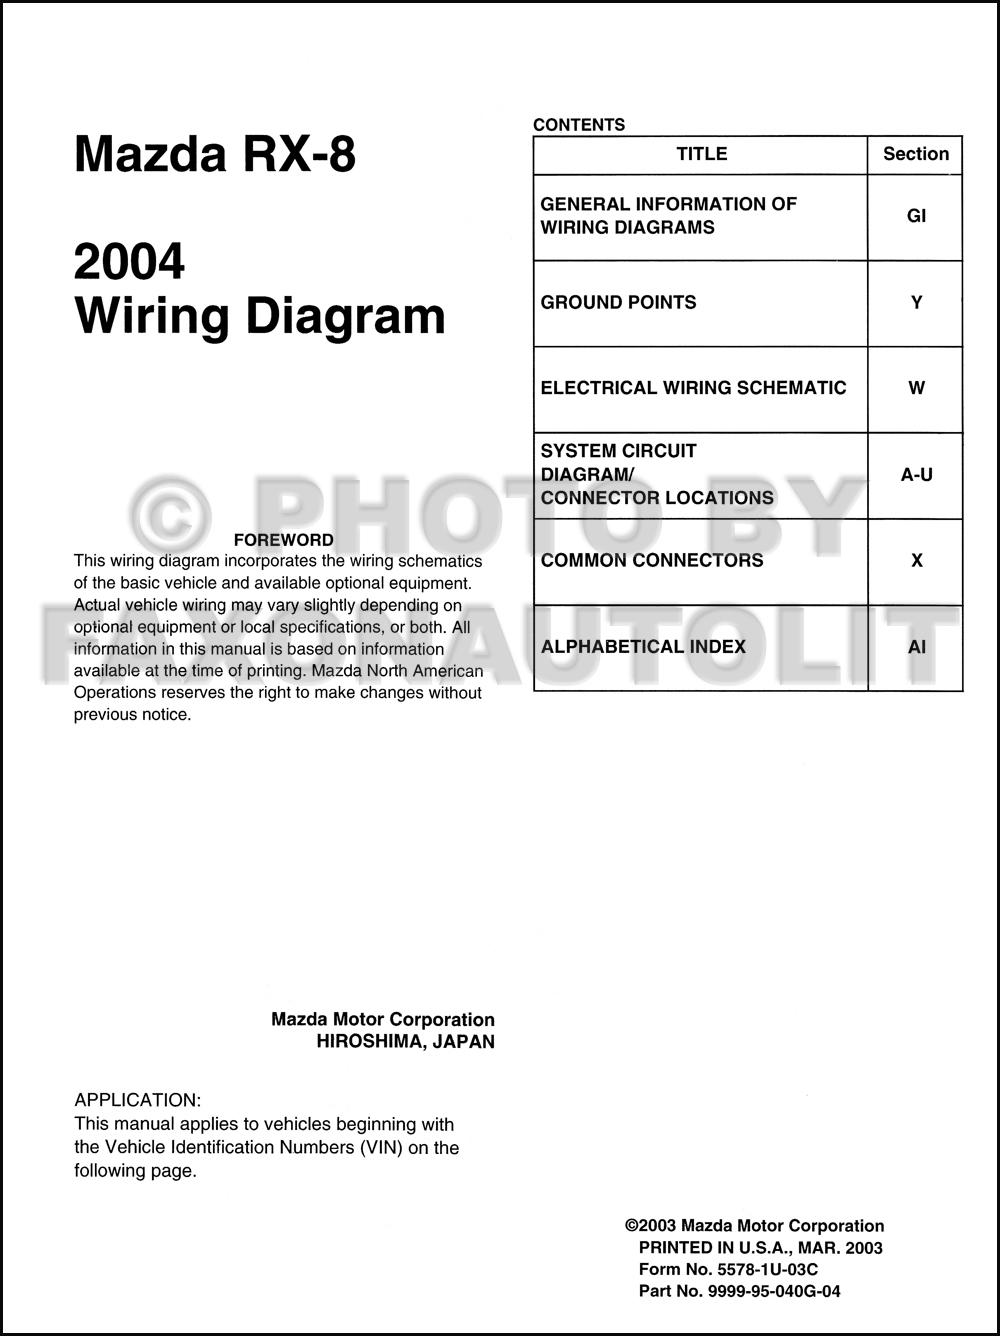 2004 rx 8 wiring diagram workshop manual 2004 2004 mazda rx 8 wiring diagram manual original rx8 on 2004 rx 8 wiring diagram workshop